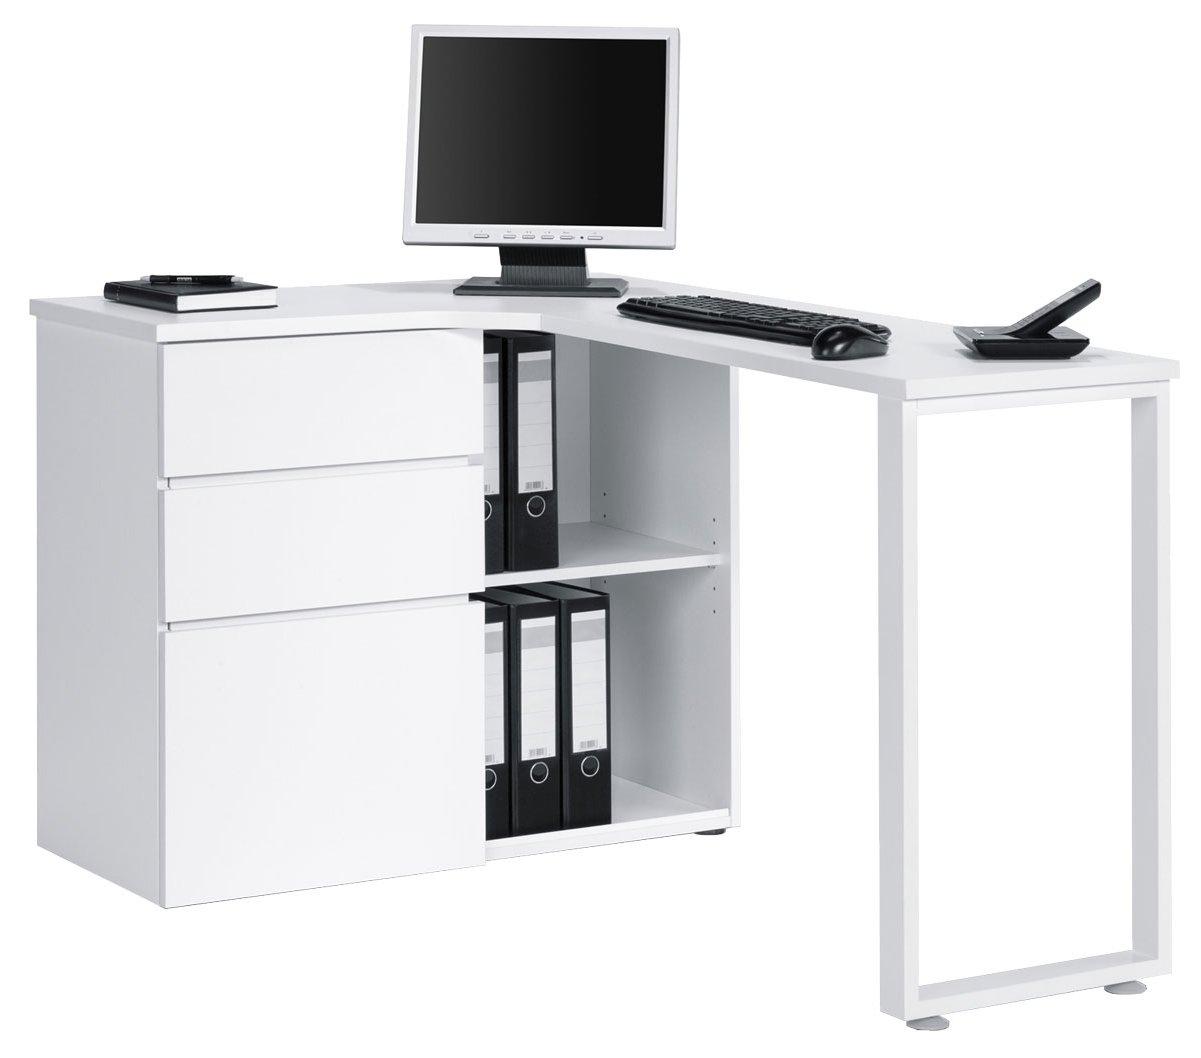 office corner workstation. Maja Penninsular White Corner Desk Main Image Office Workstation E